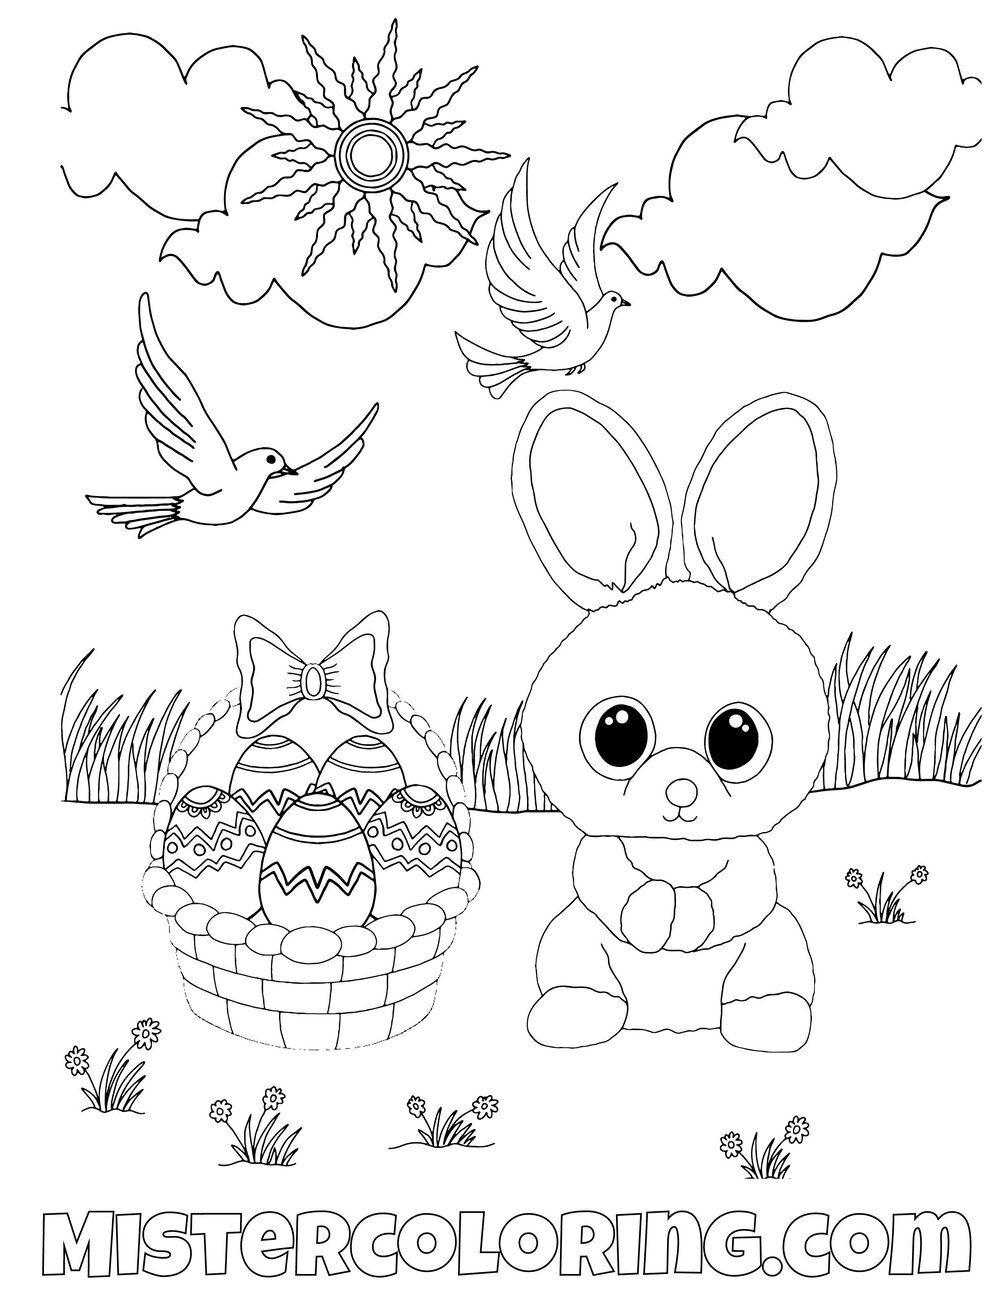 Easter Bunny Beanie Boo Coloring Pages For Kids Malvorlagen Ausmalbilder Boo Hund